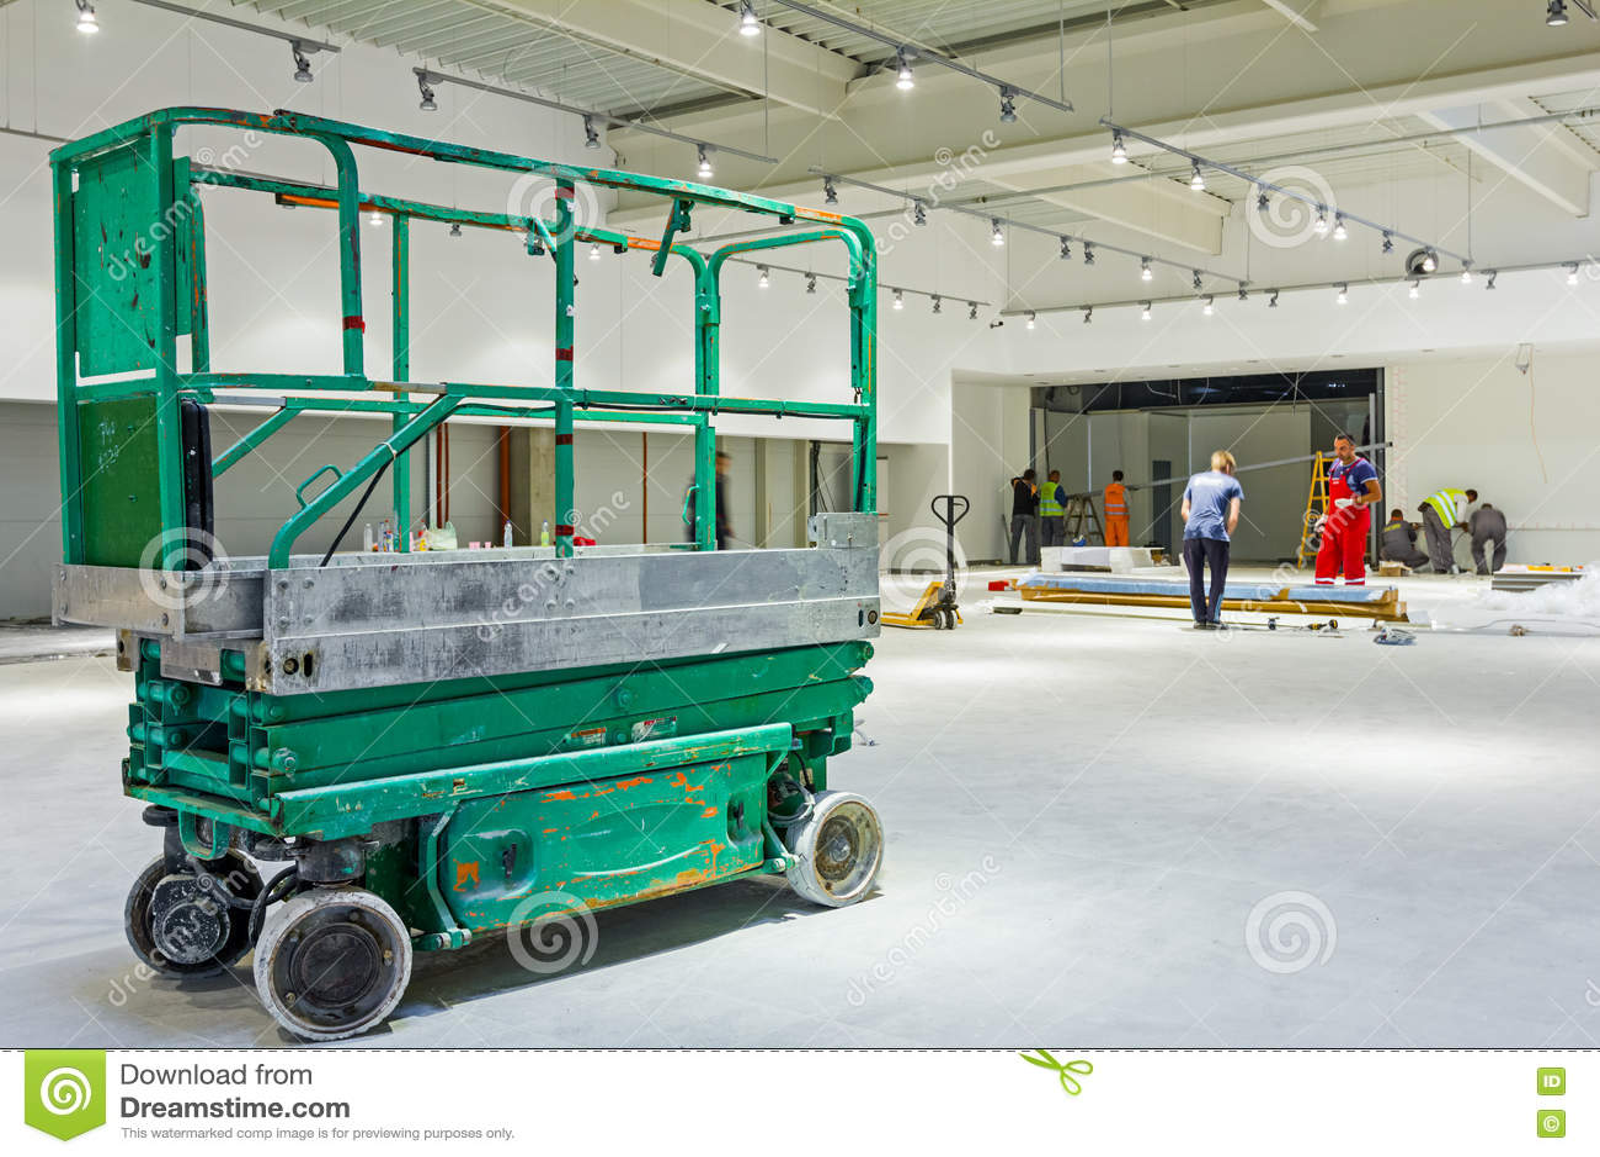 Scissor Lift Platform On A Construction Site  Editorial Image